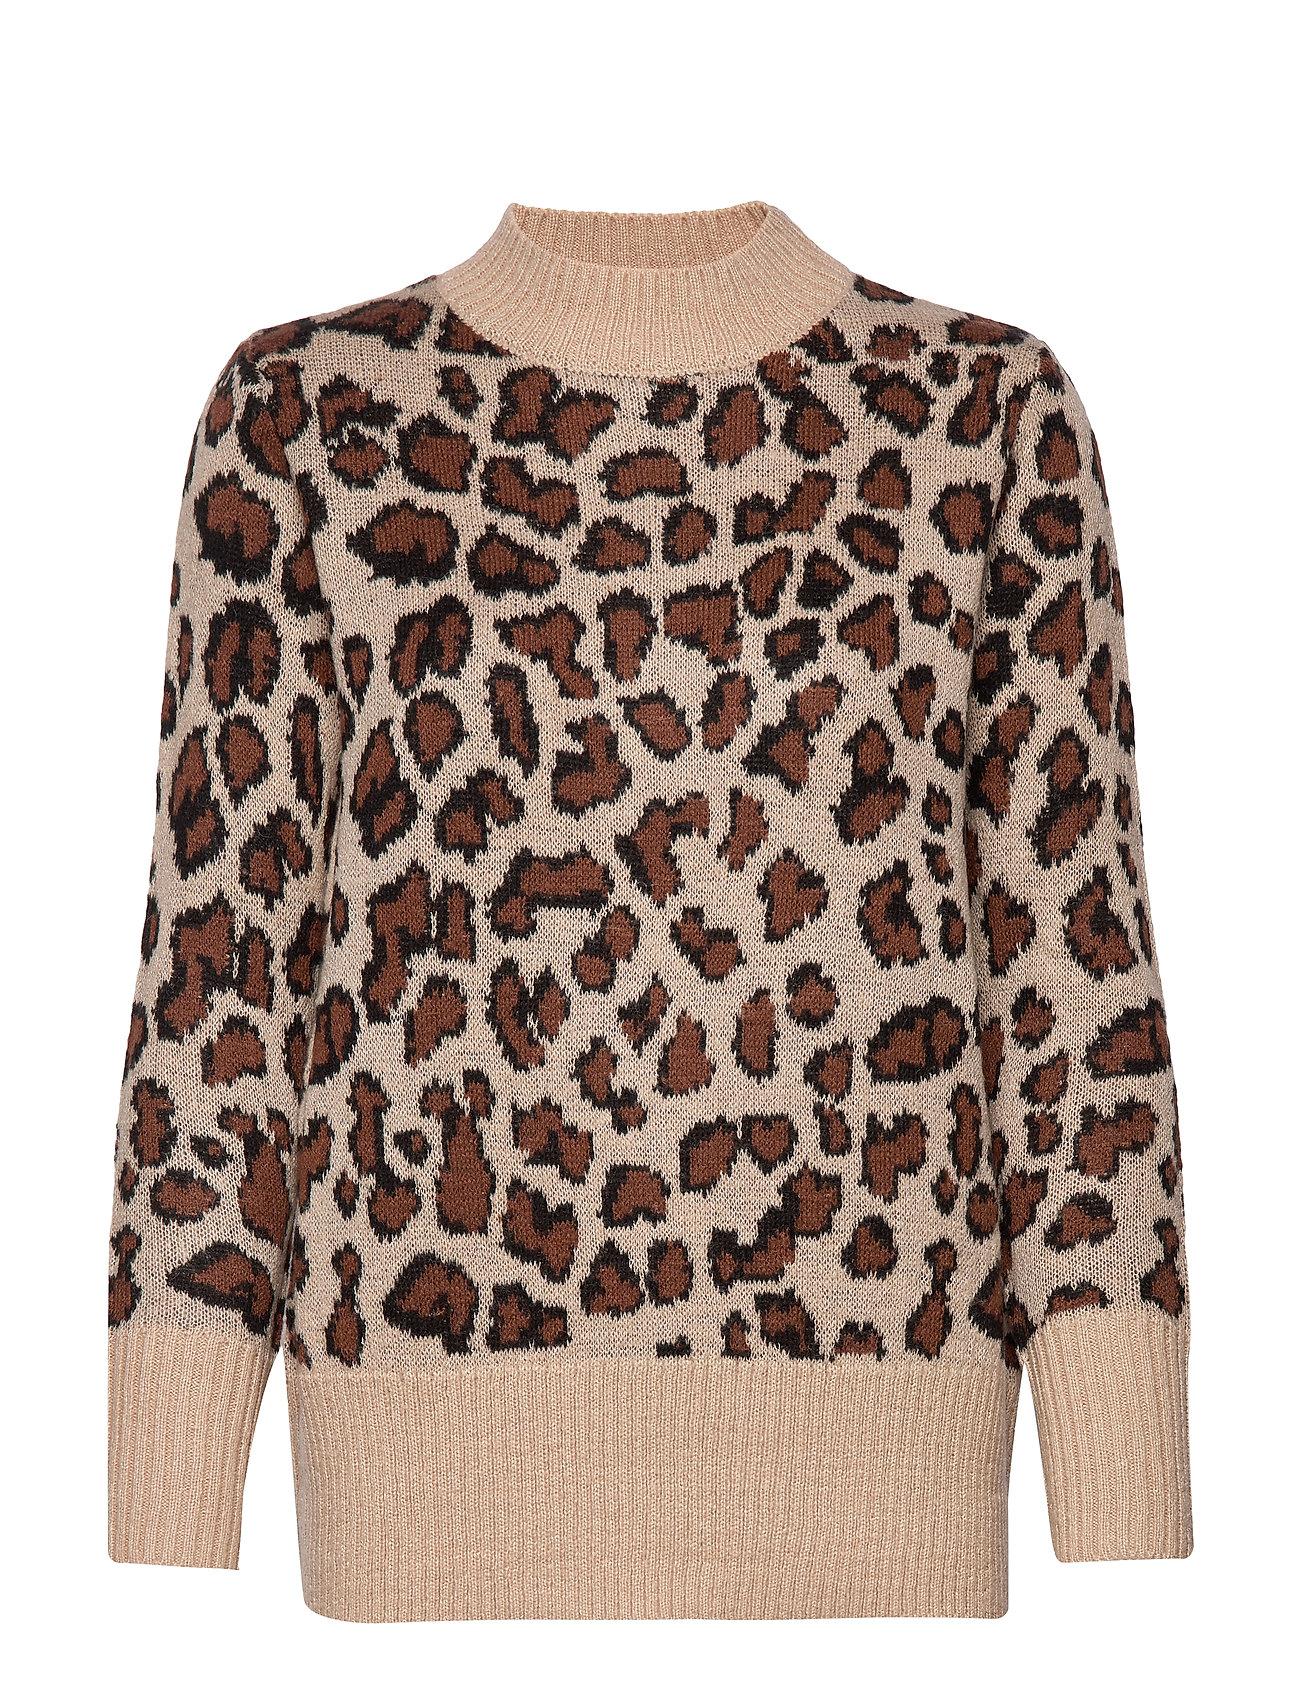 Brandtex Pullover-knit Heavy - LEOPARD BROWN